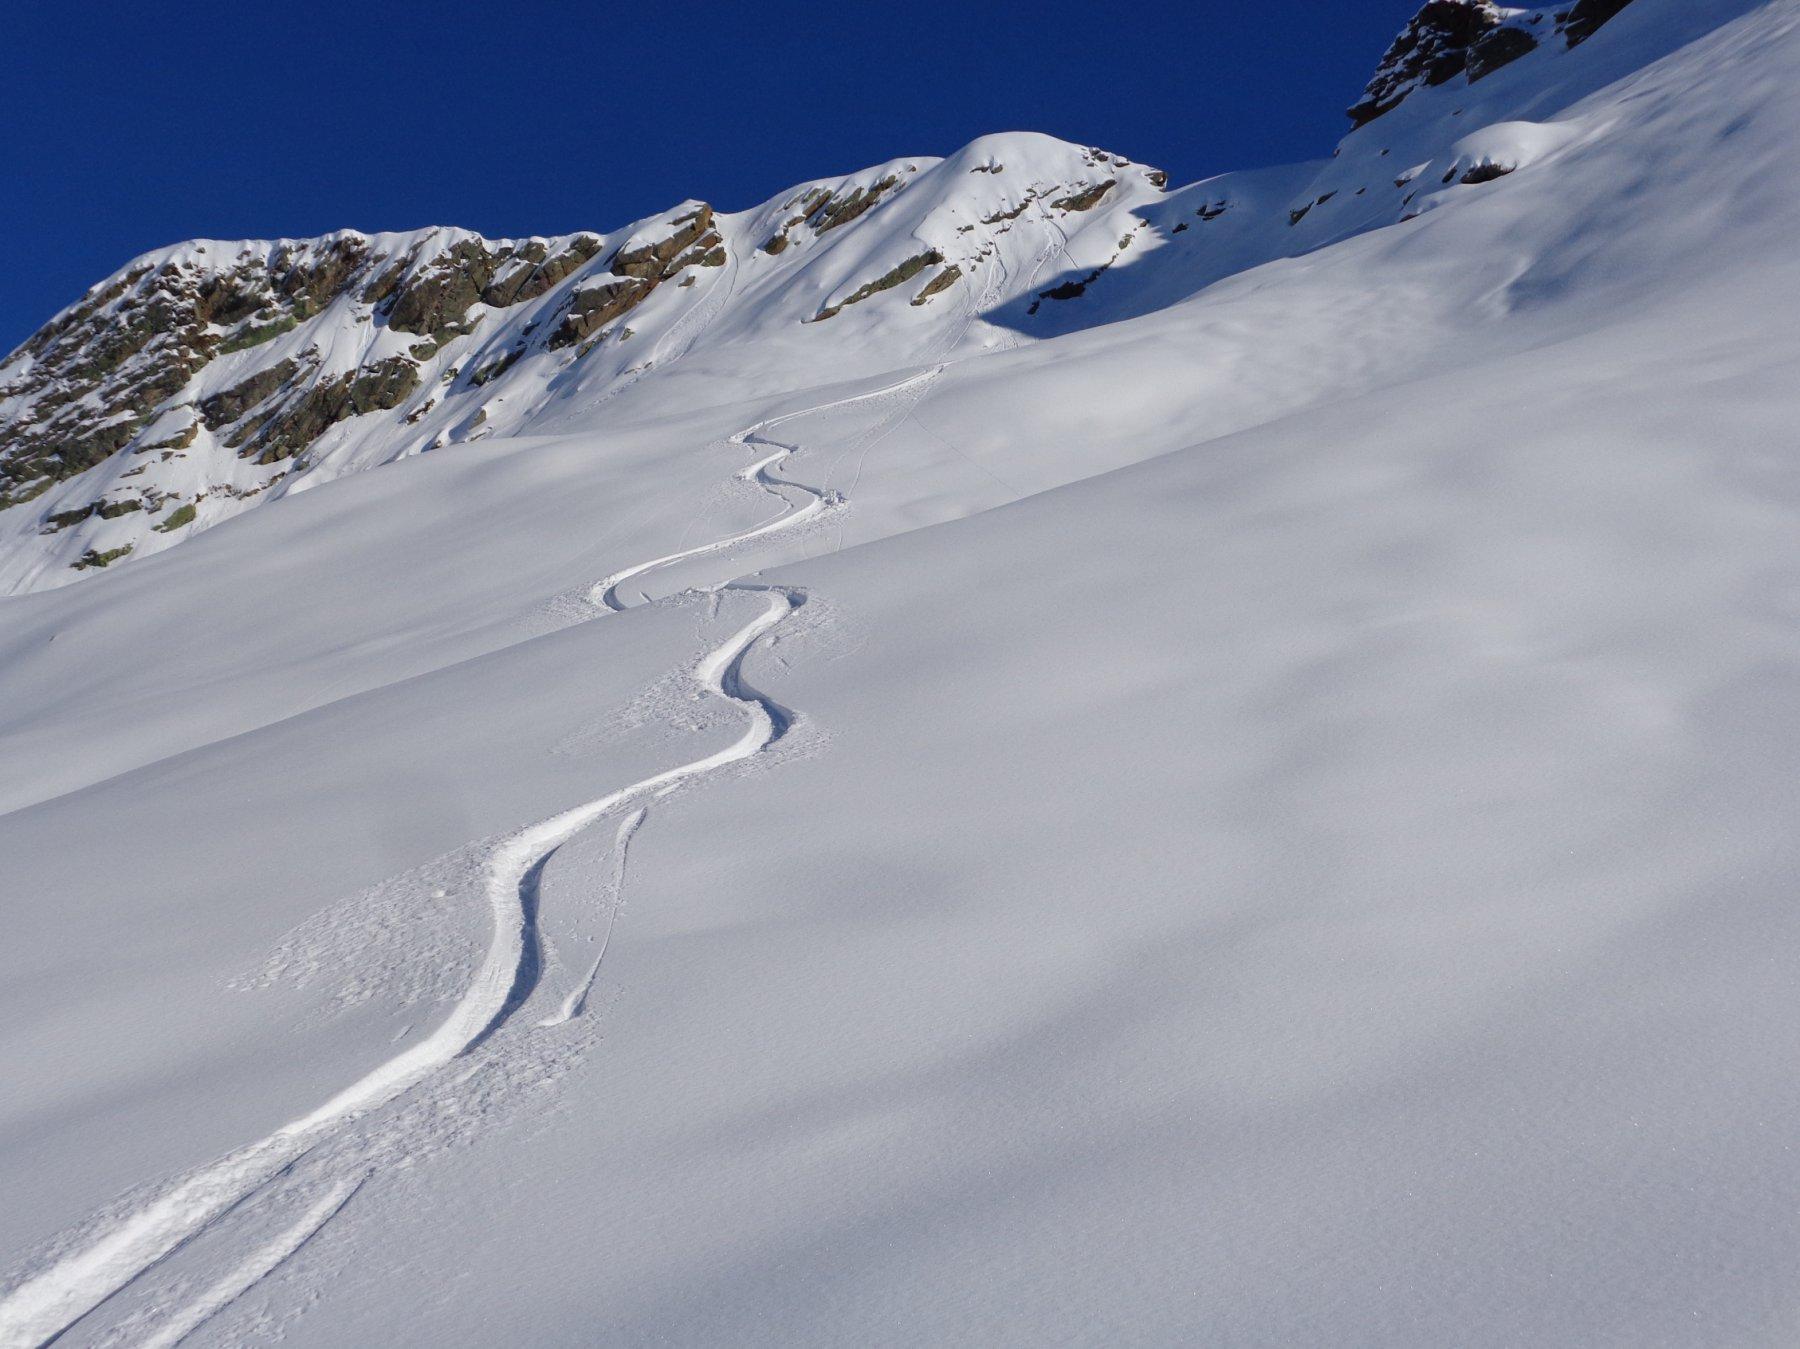 bellissima neve